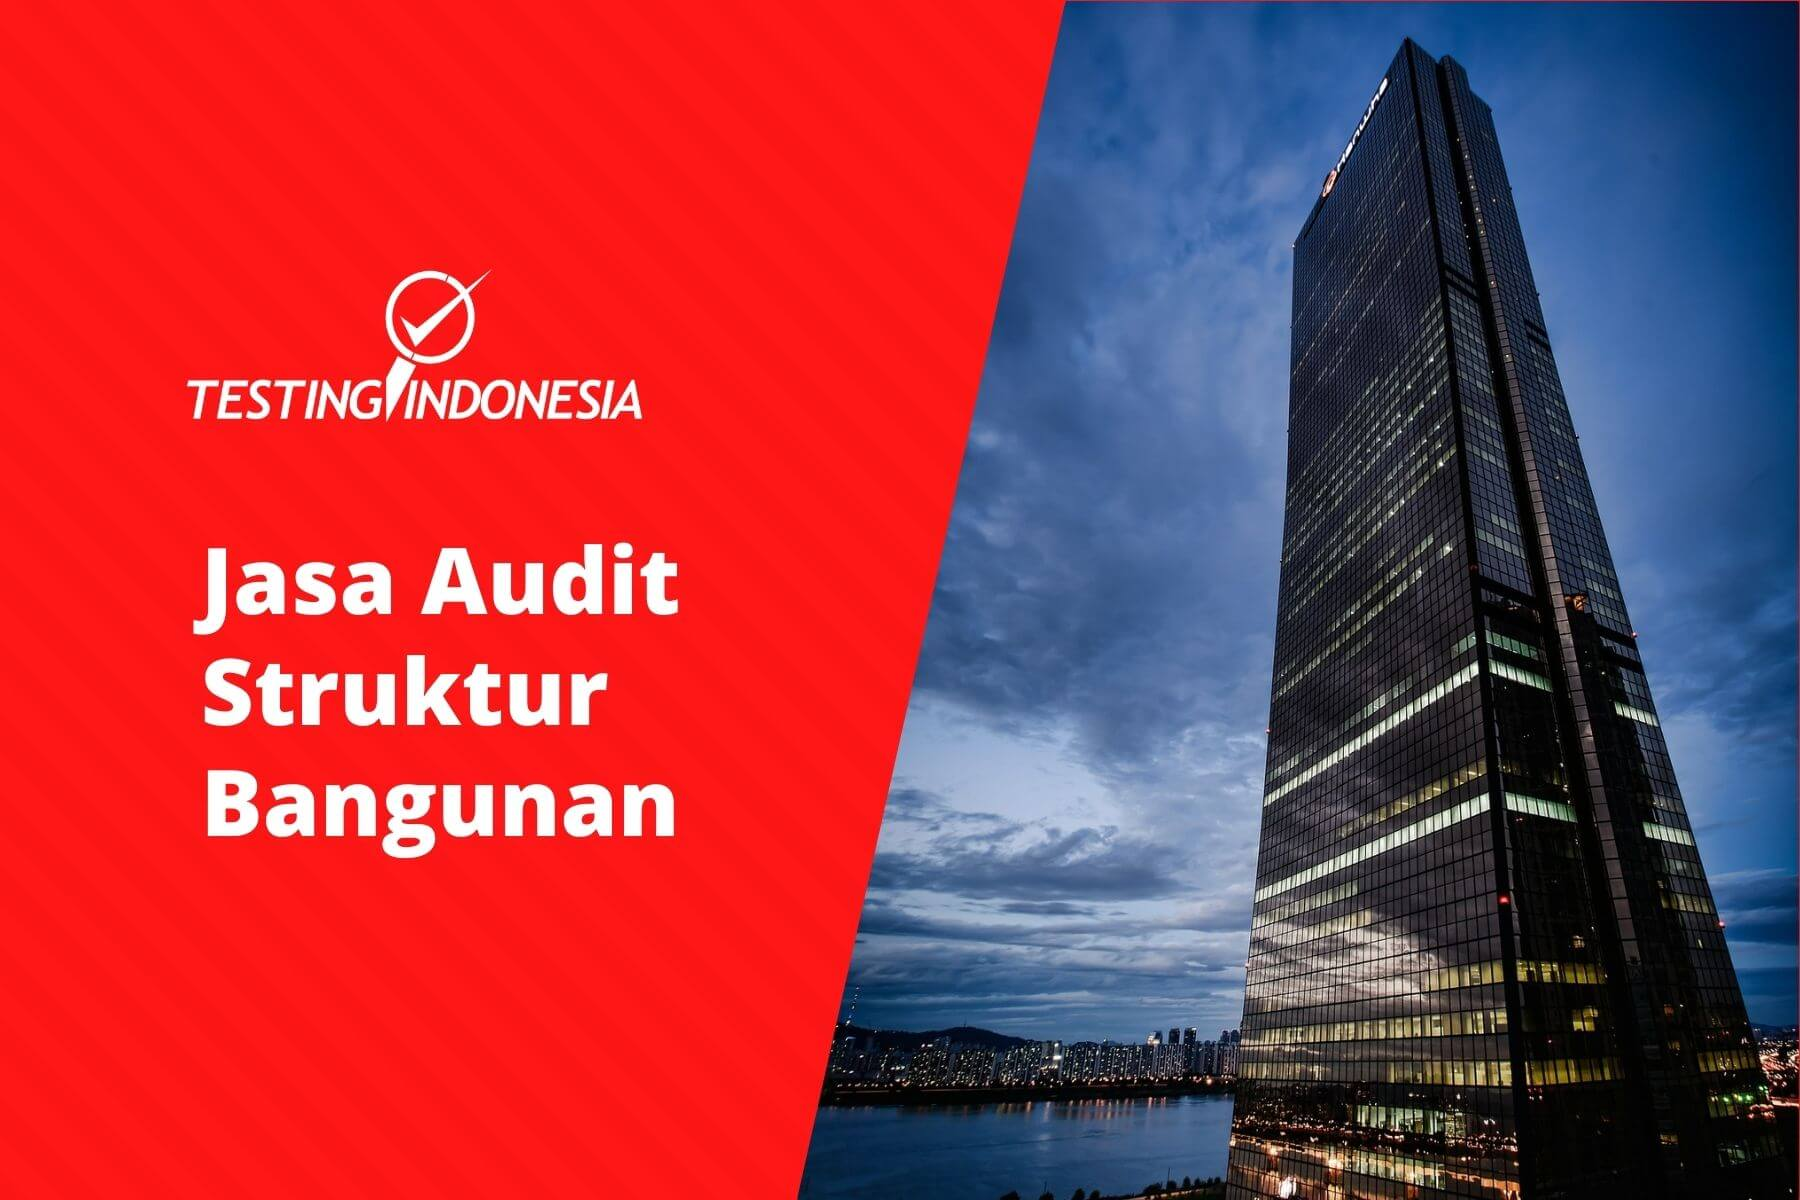 Jasa Audit Struktur Bangunan